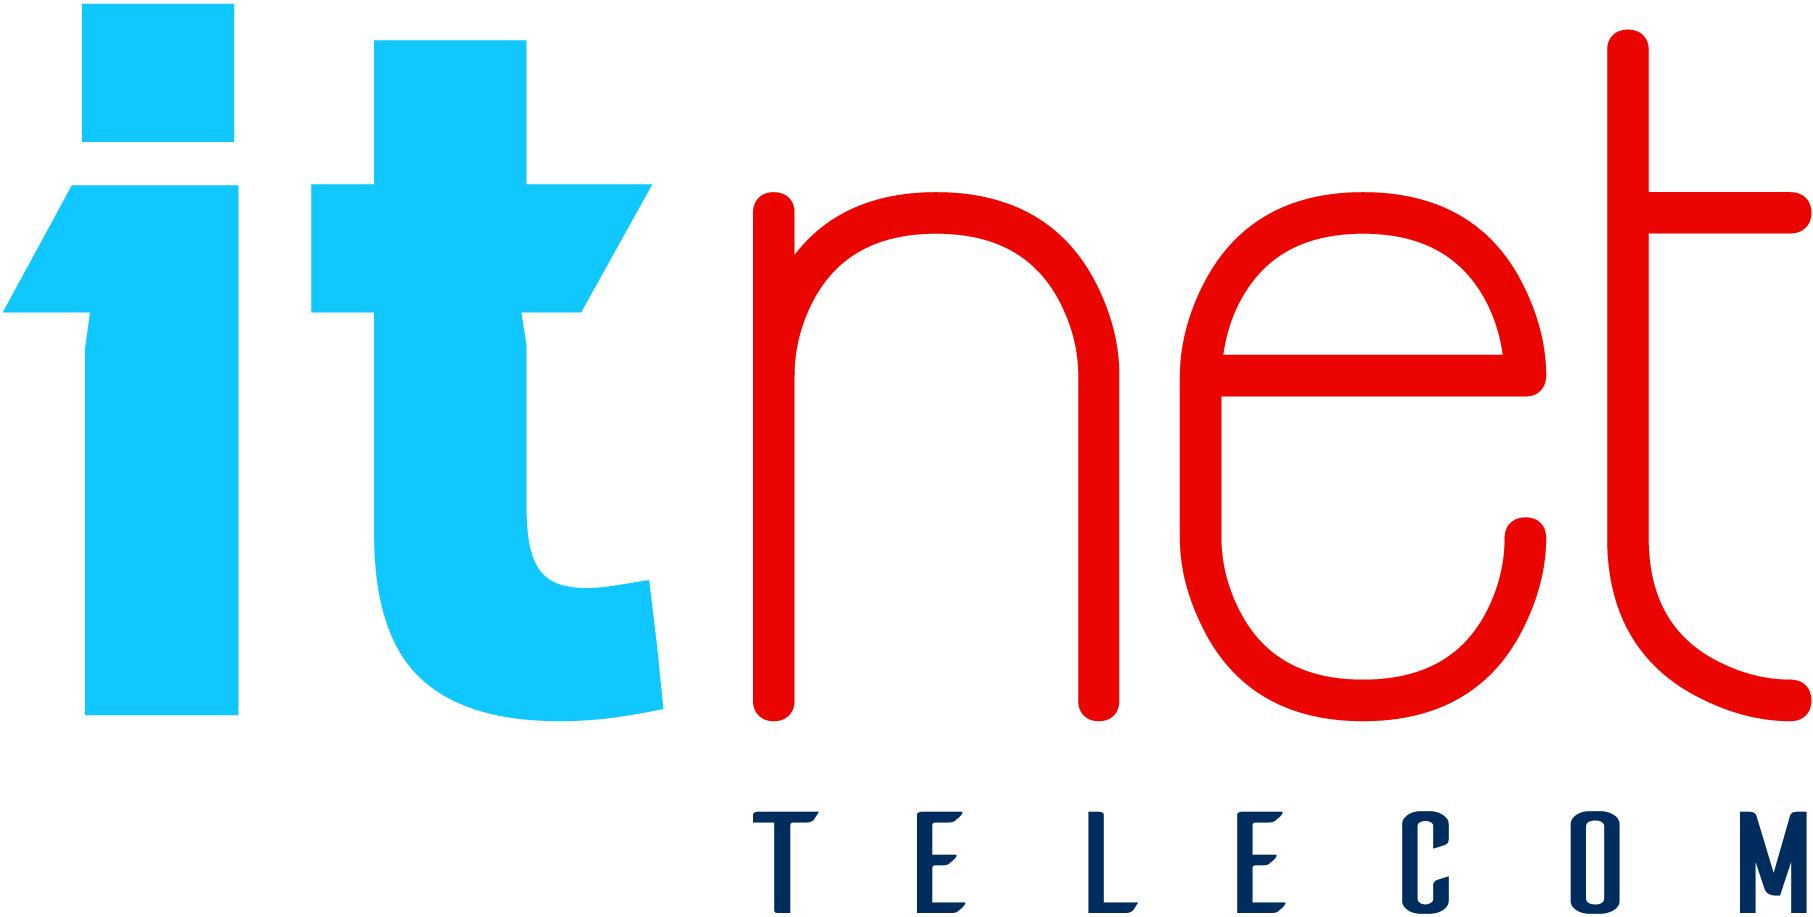 ITNET Telecom